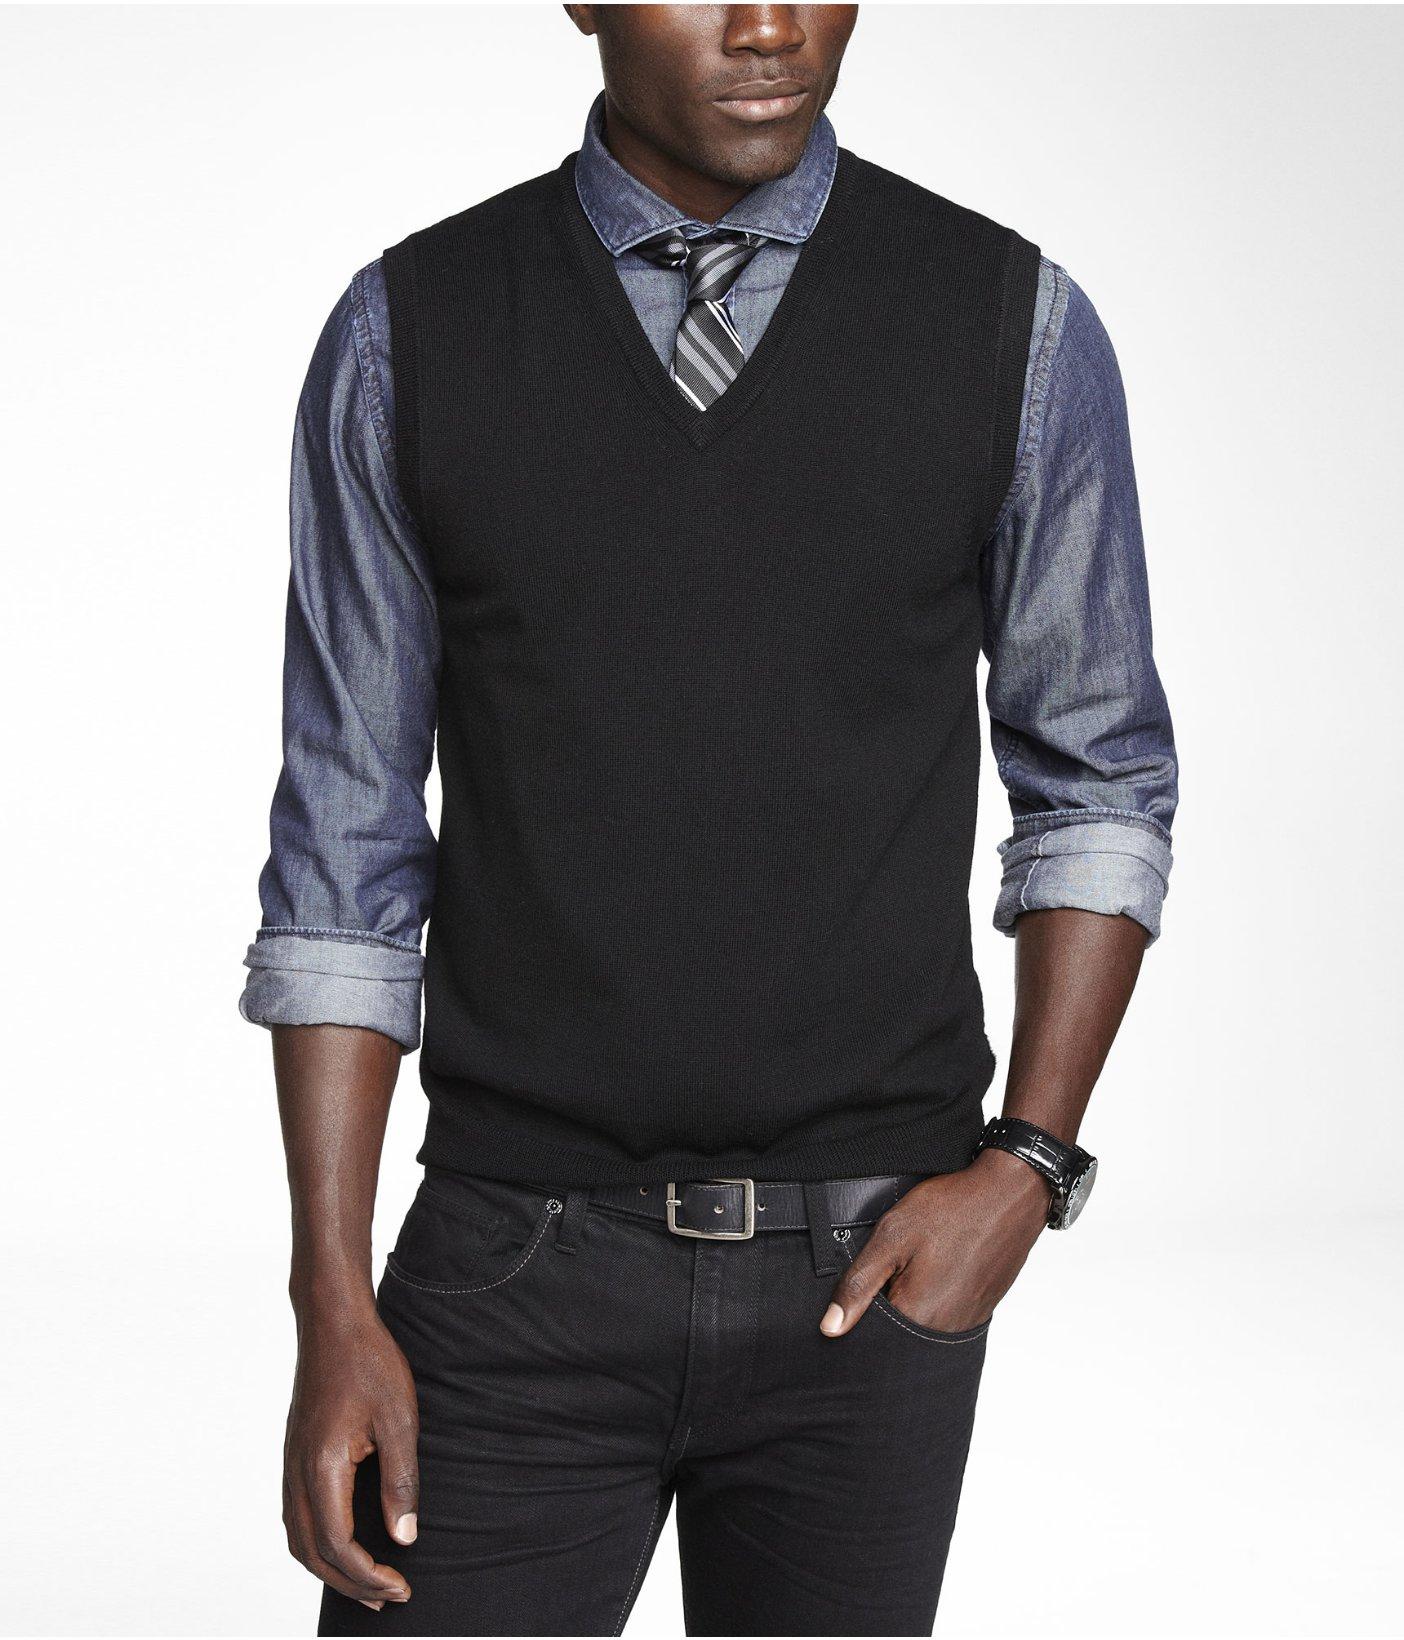 Express Merino Wool Sweater Vest in Black for Men | Lyst